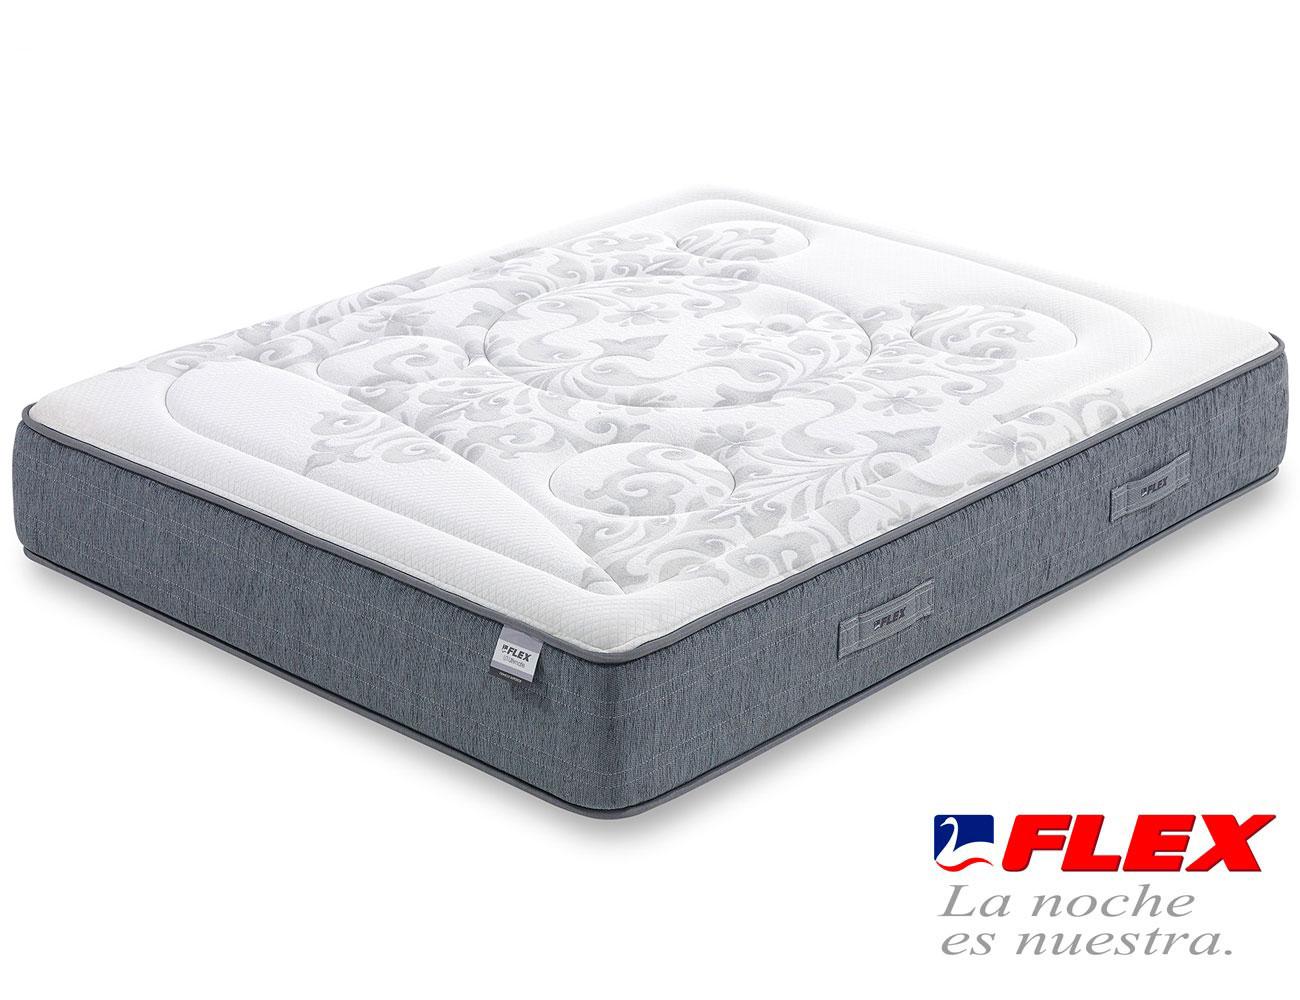 Colchon flex airvex viscoelastica gel garbi superior3